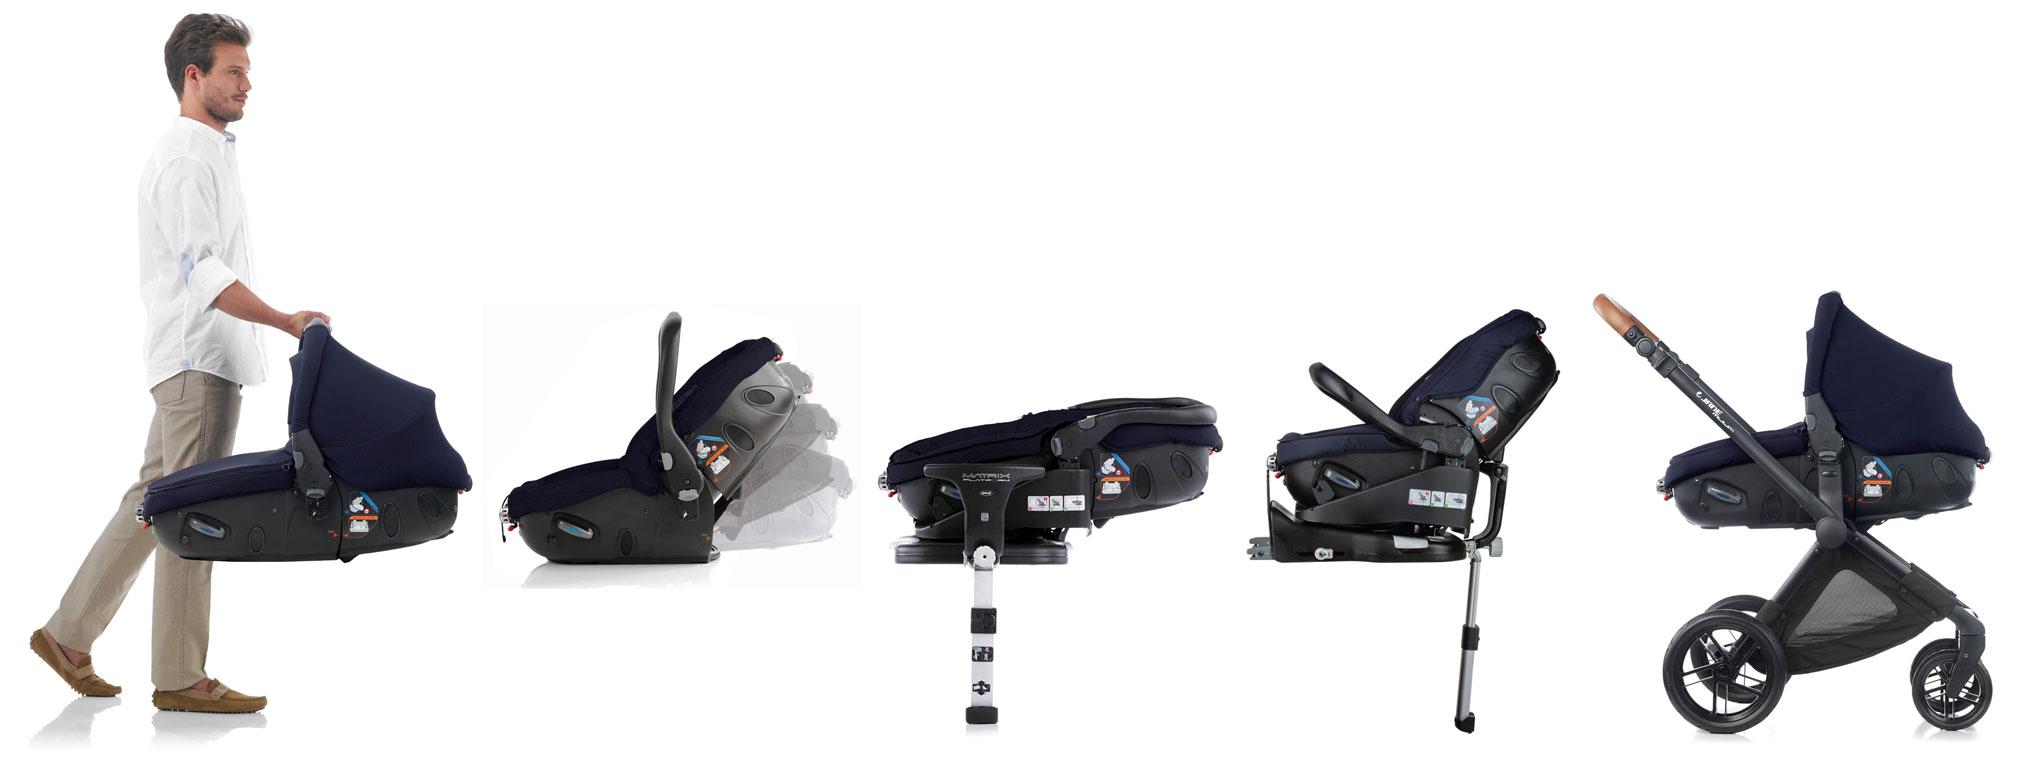 carseat-matrixlight2-line.jpg